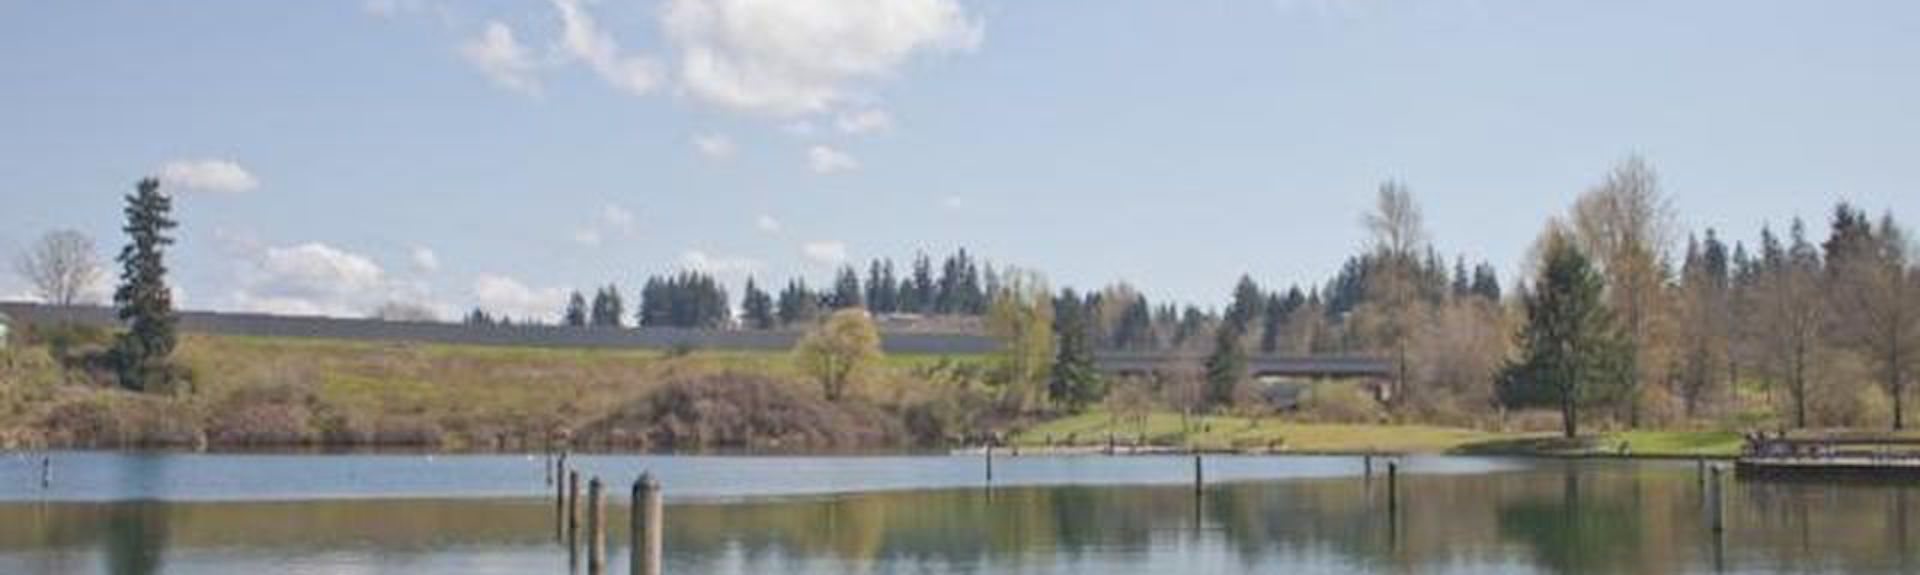 Happy Valley, Oregon, Verenigde Staten